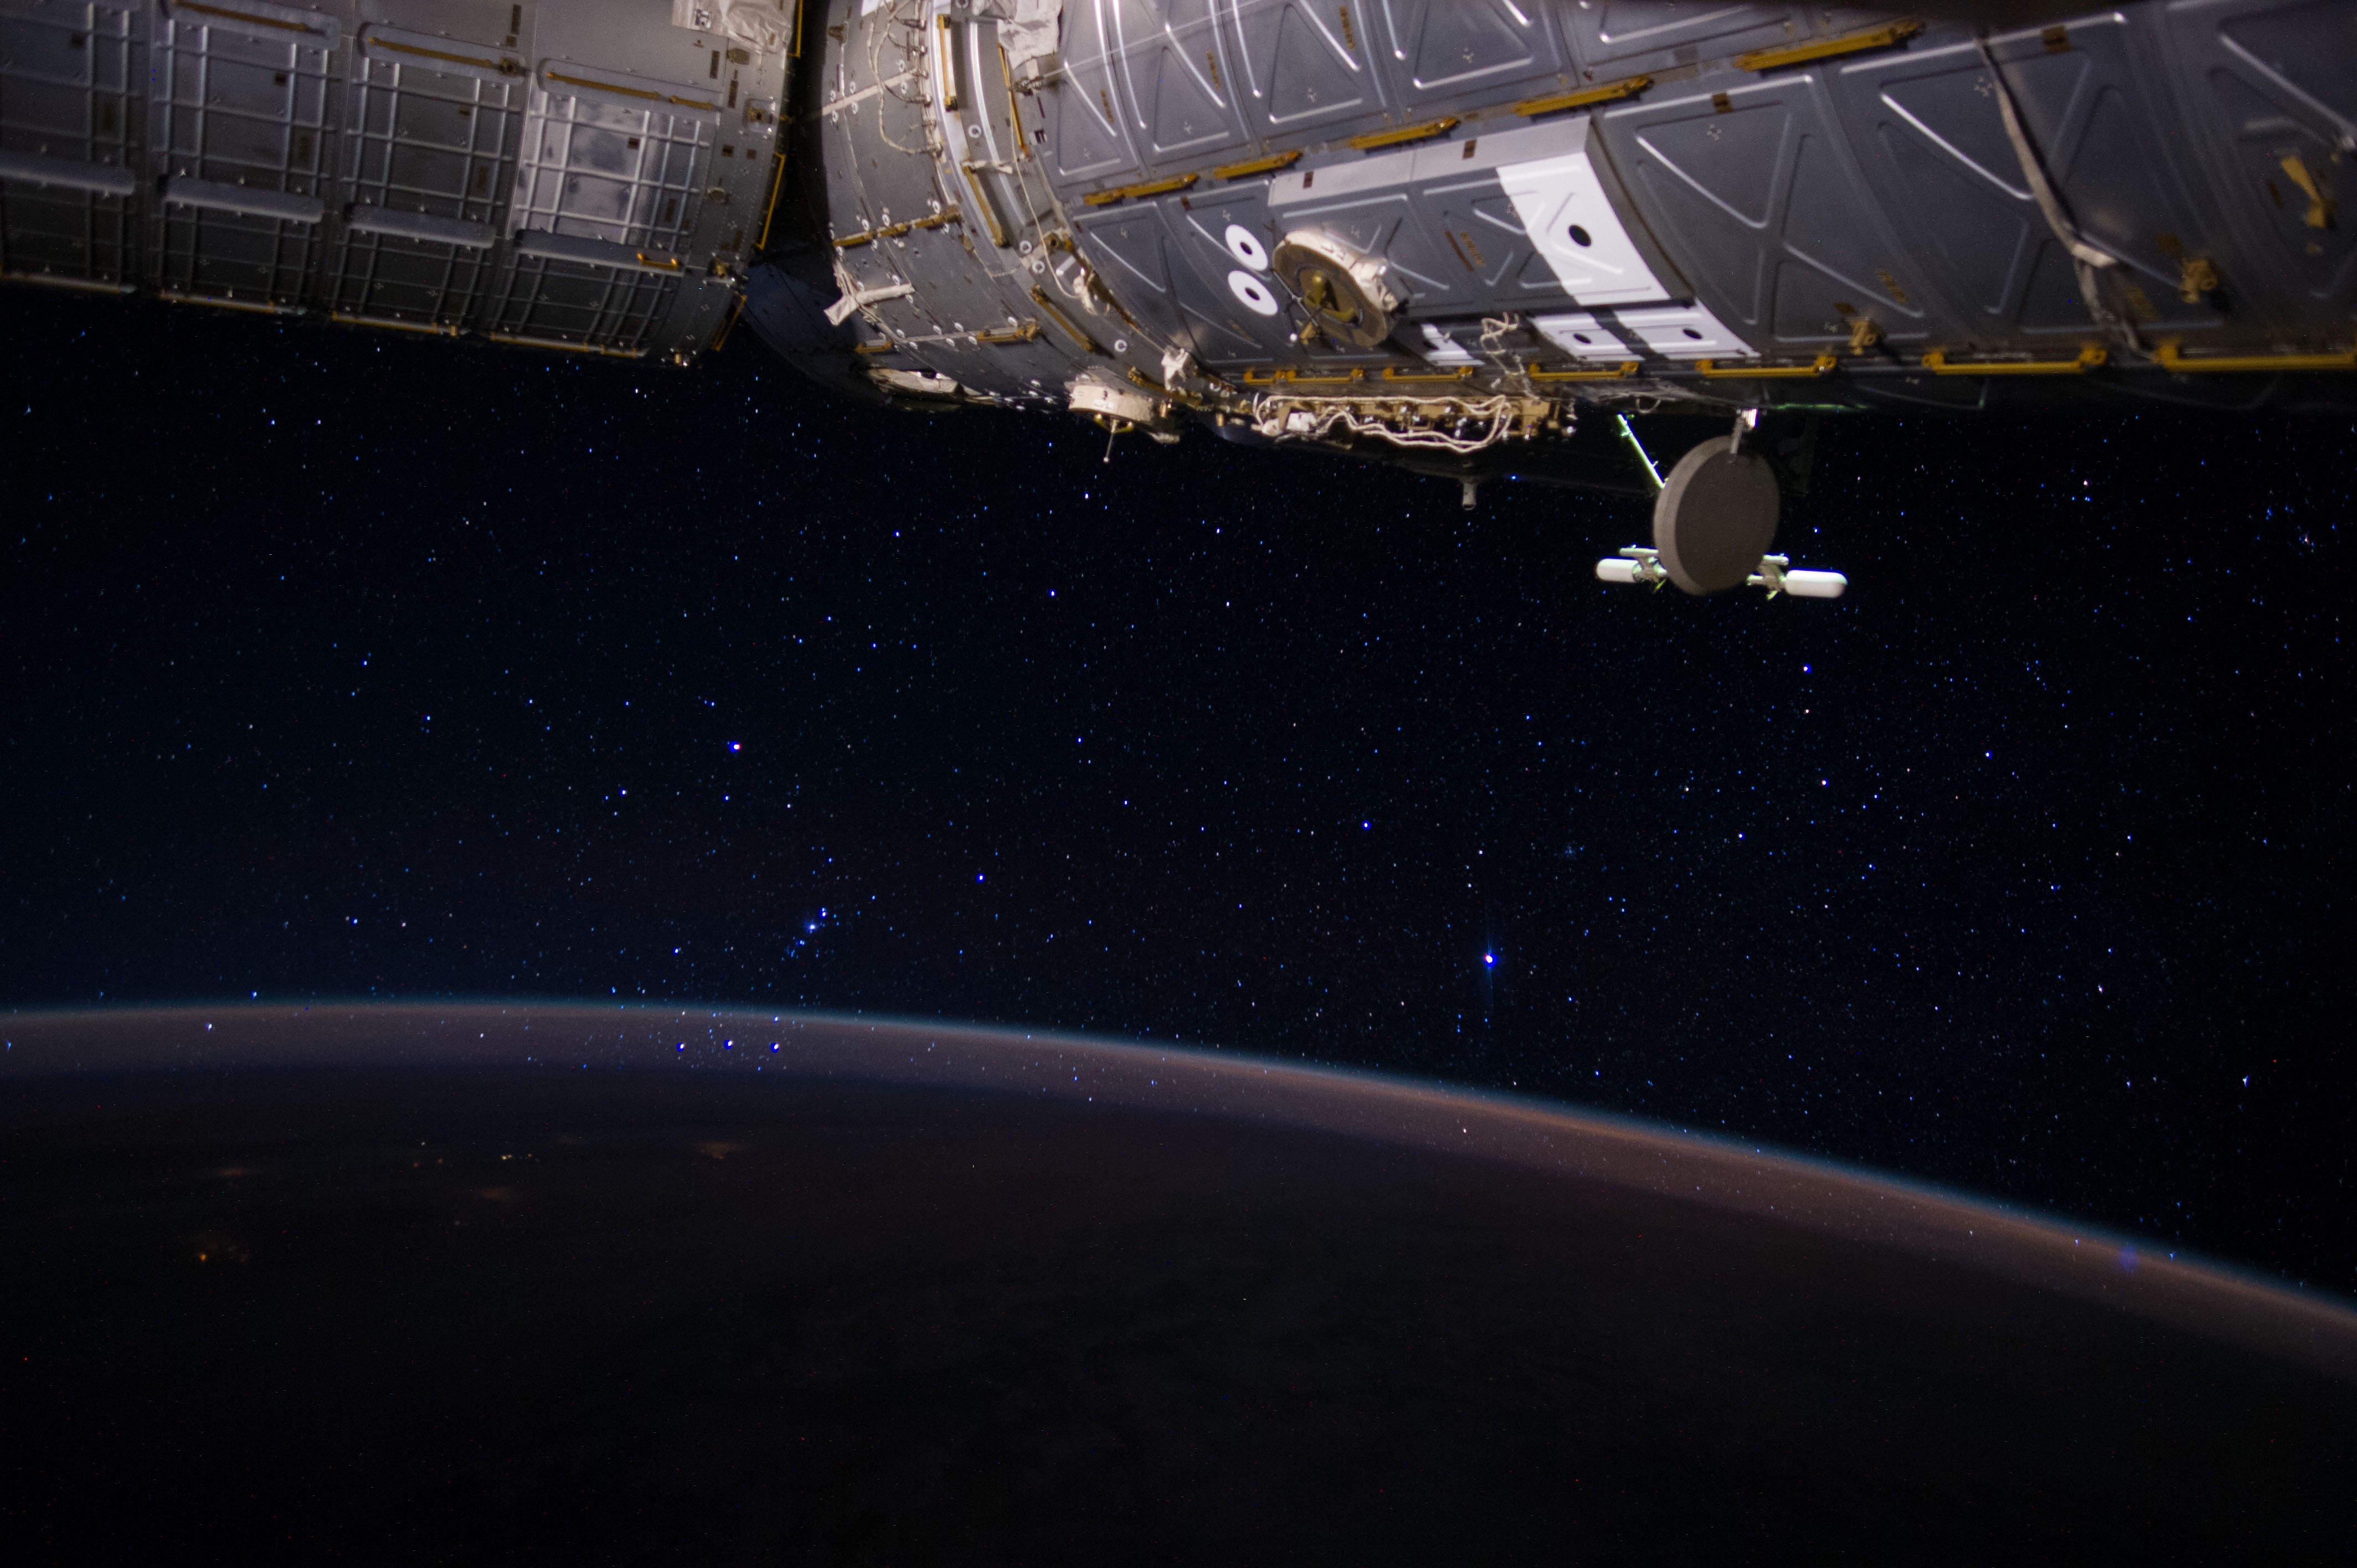 Orion's Belt Rises Through the Atmosphere | NASA